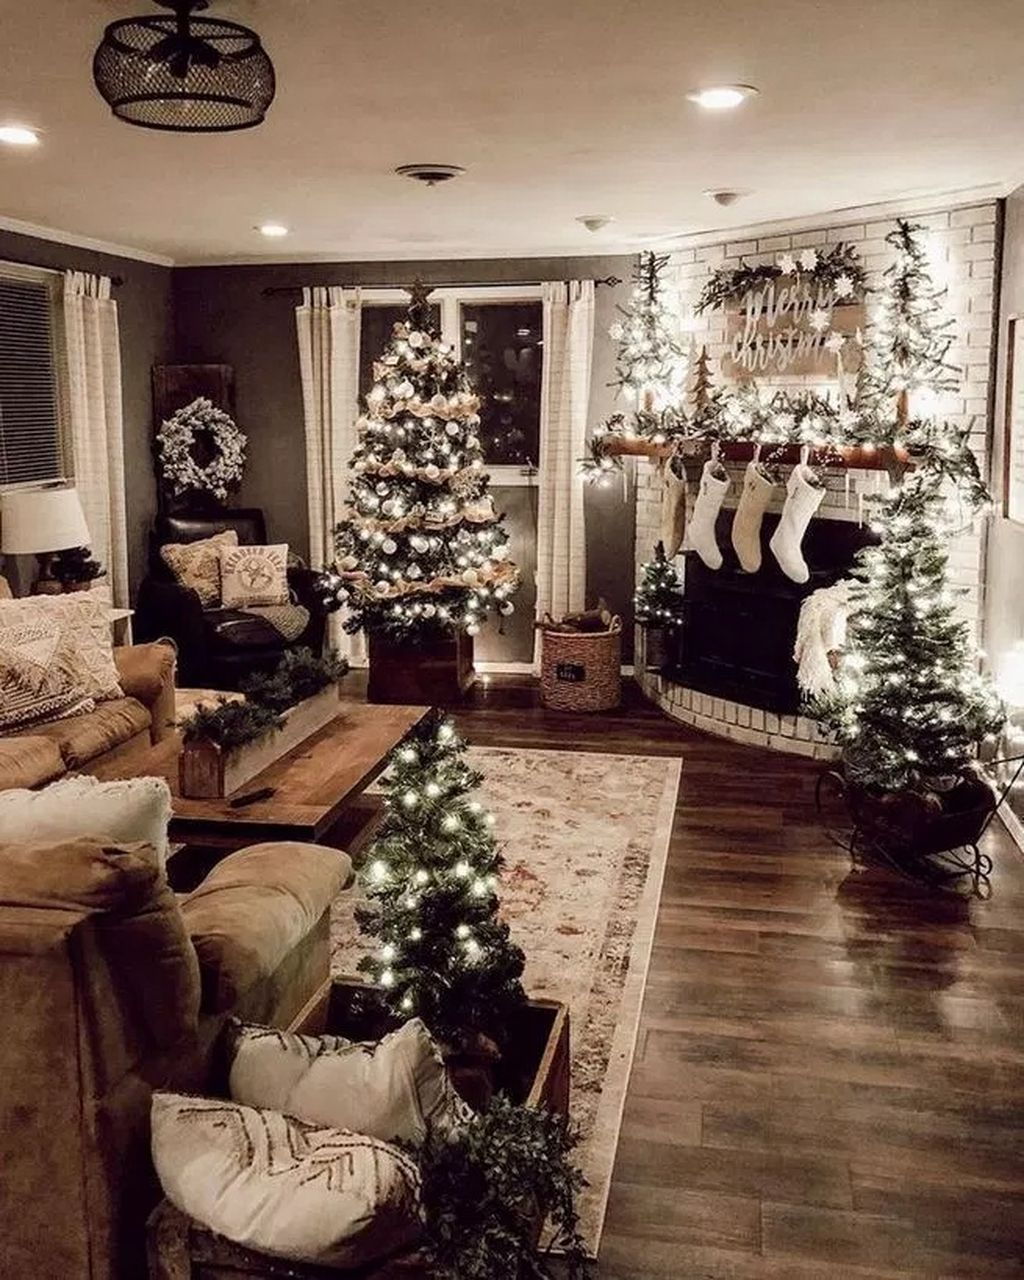 37 Wonderful Christmas Living Room Decor Ideas To Try Christmas Decorations Living Room Christmas Apartment Christmas Decorations Rustic Christmas living room decorations